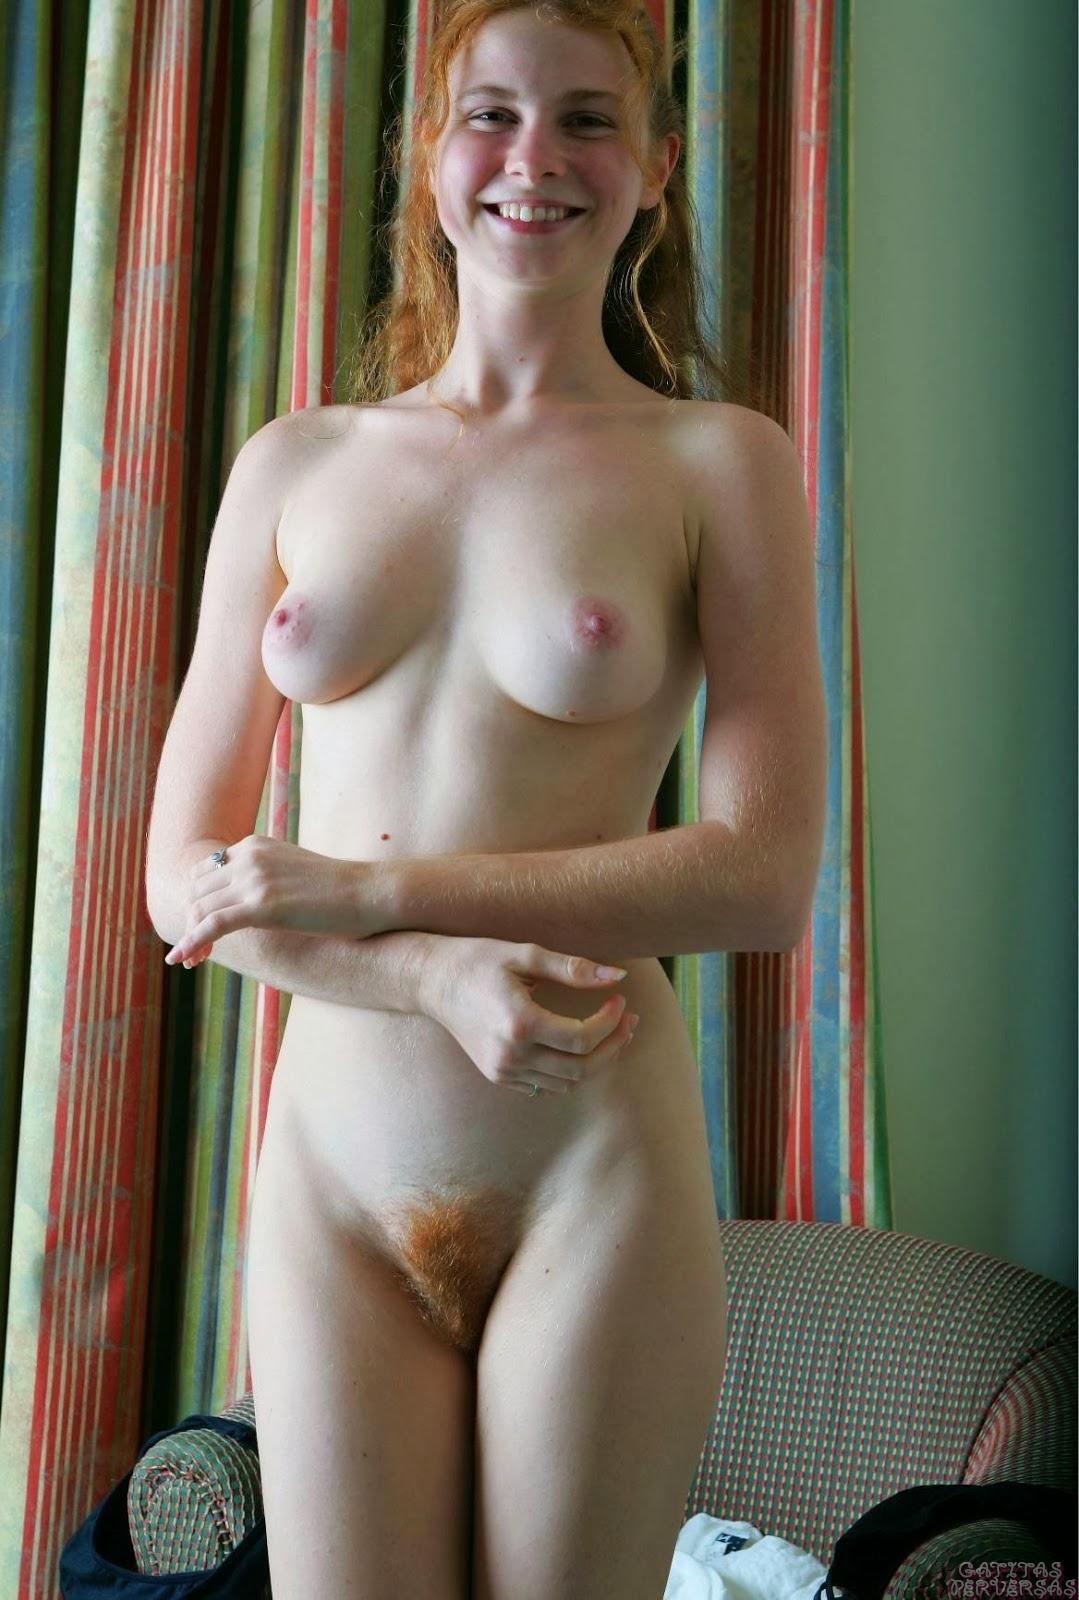 18 Años Pelirrojas Porno jovencita pelirroja desnuda | fotos porno xxx | chicas desnudas